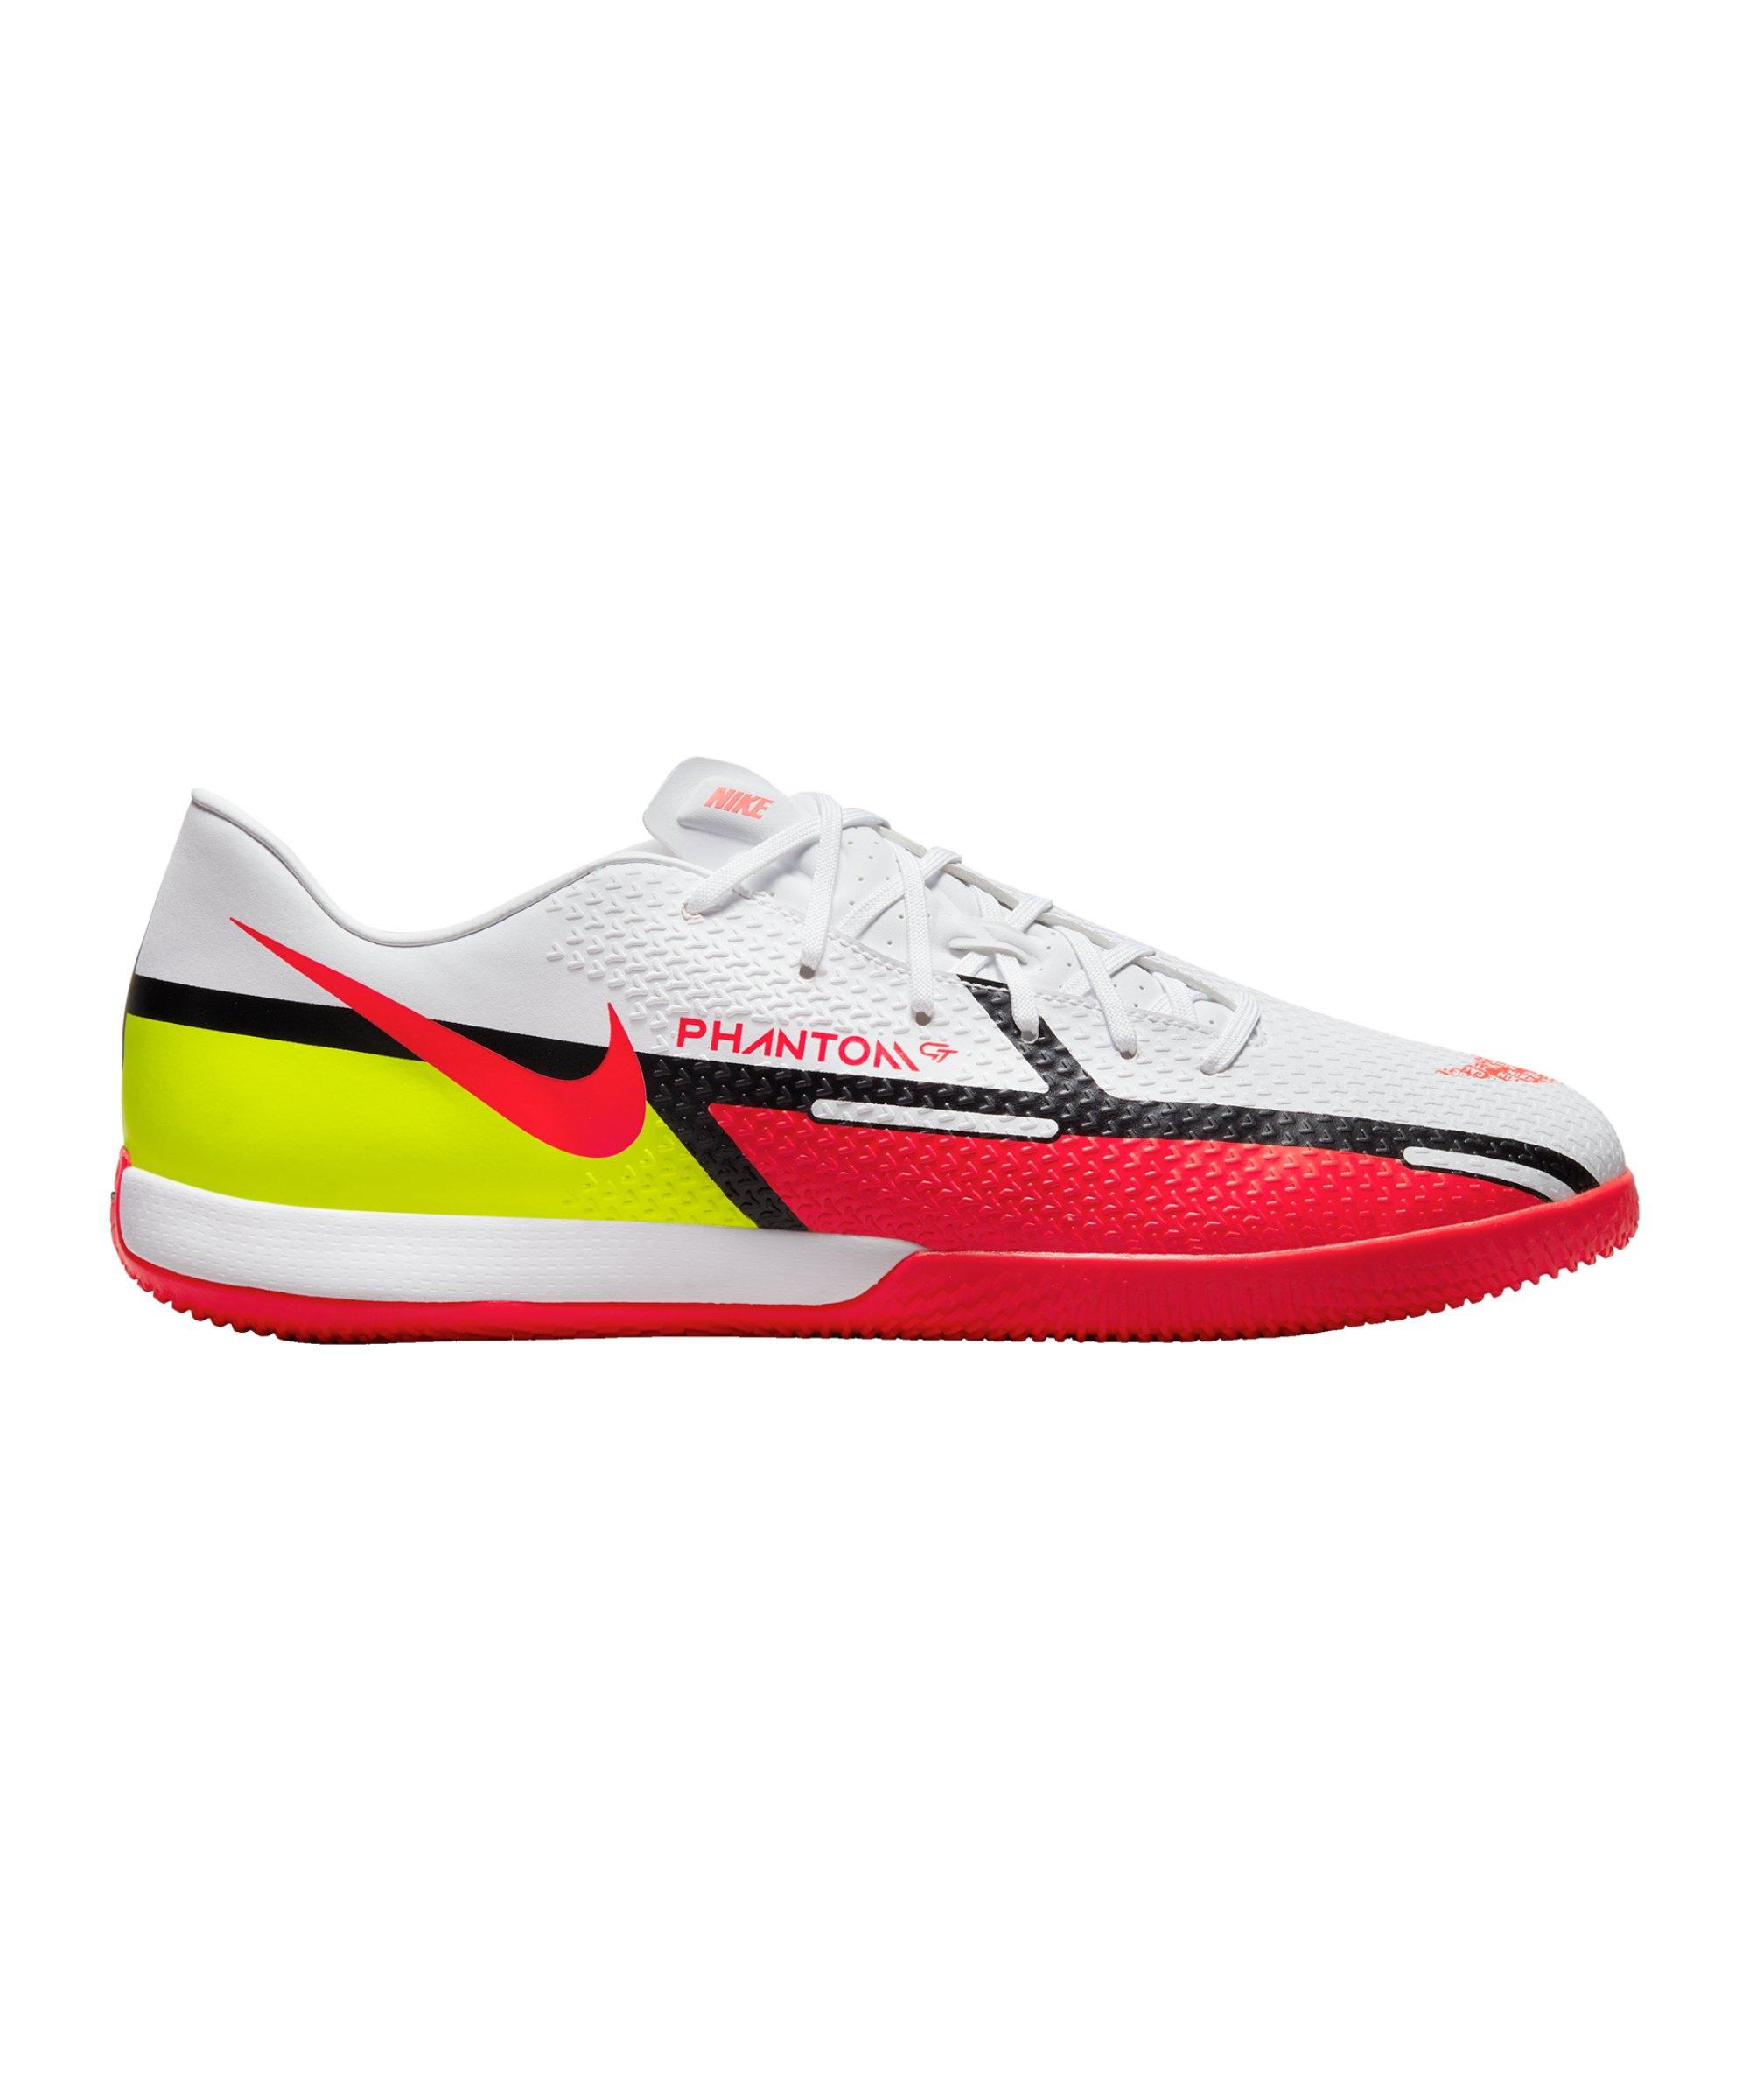 Nike Phantom GT2 Motivation Academy IC Halle Weiss Rot F167 - weiss